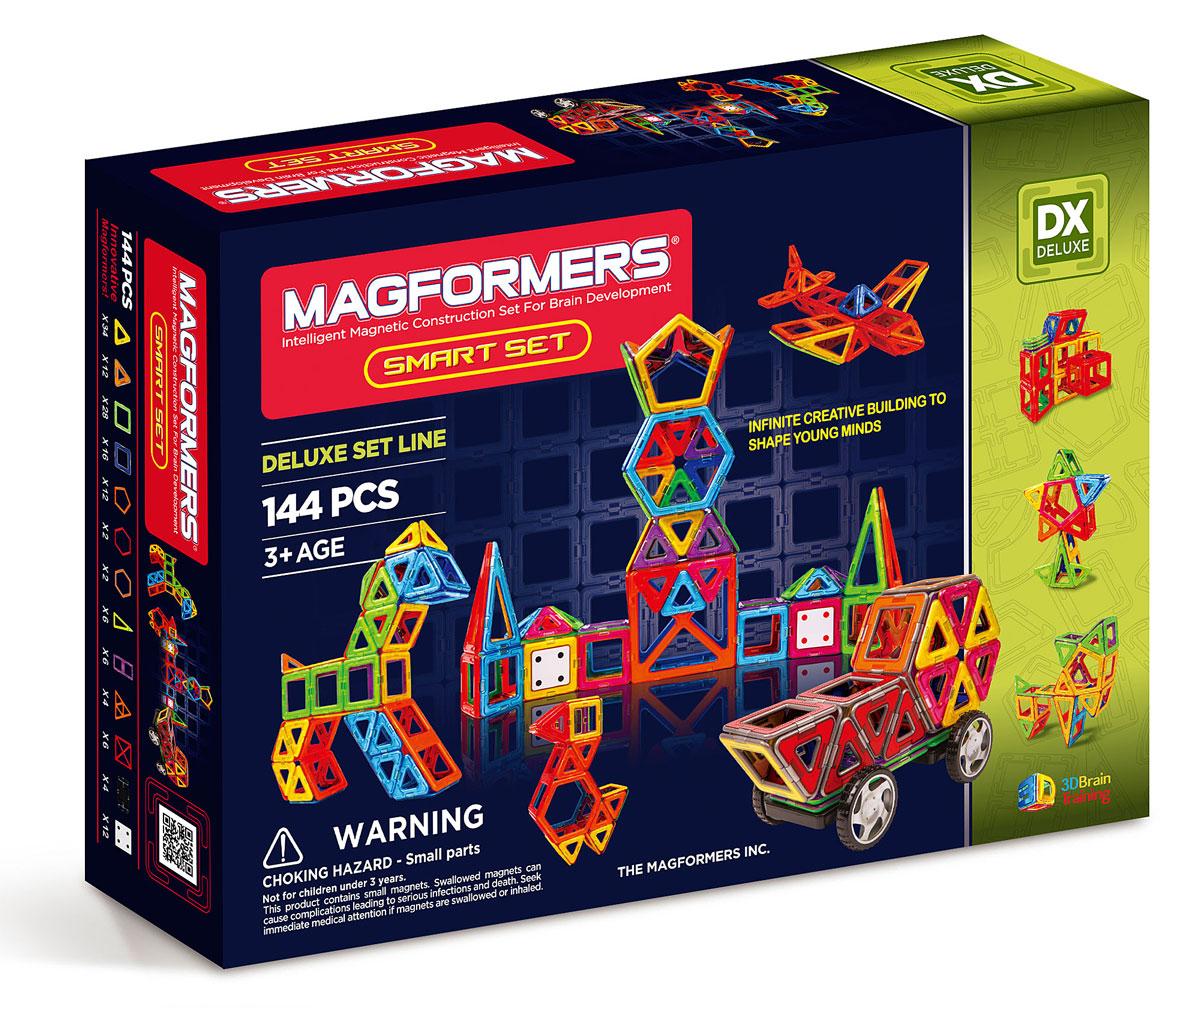 Magformers Магнитный конструктор Smart Set magformers магнитный конструктор xl cruiser set цвет красный желтый